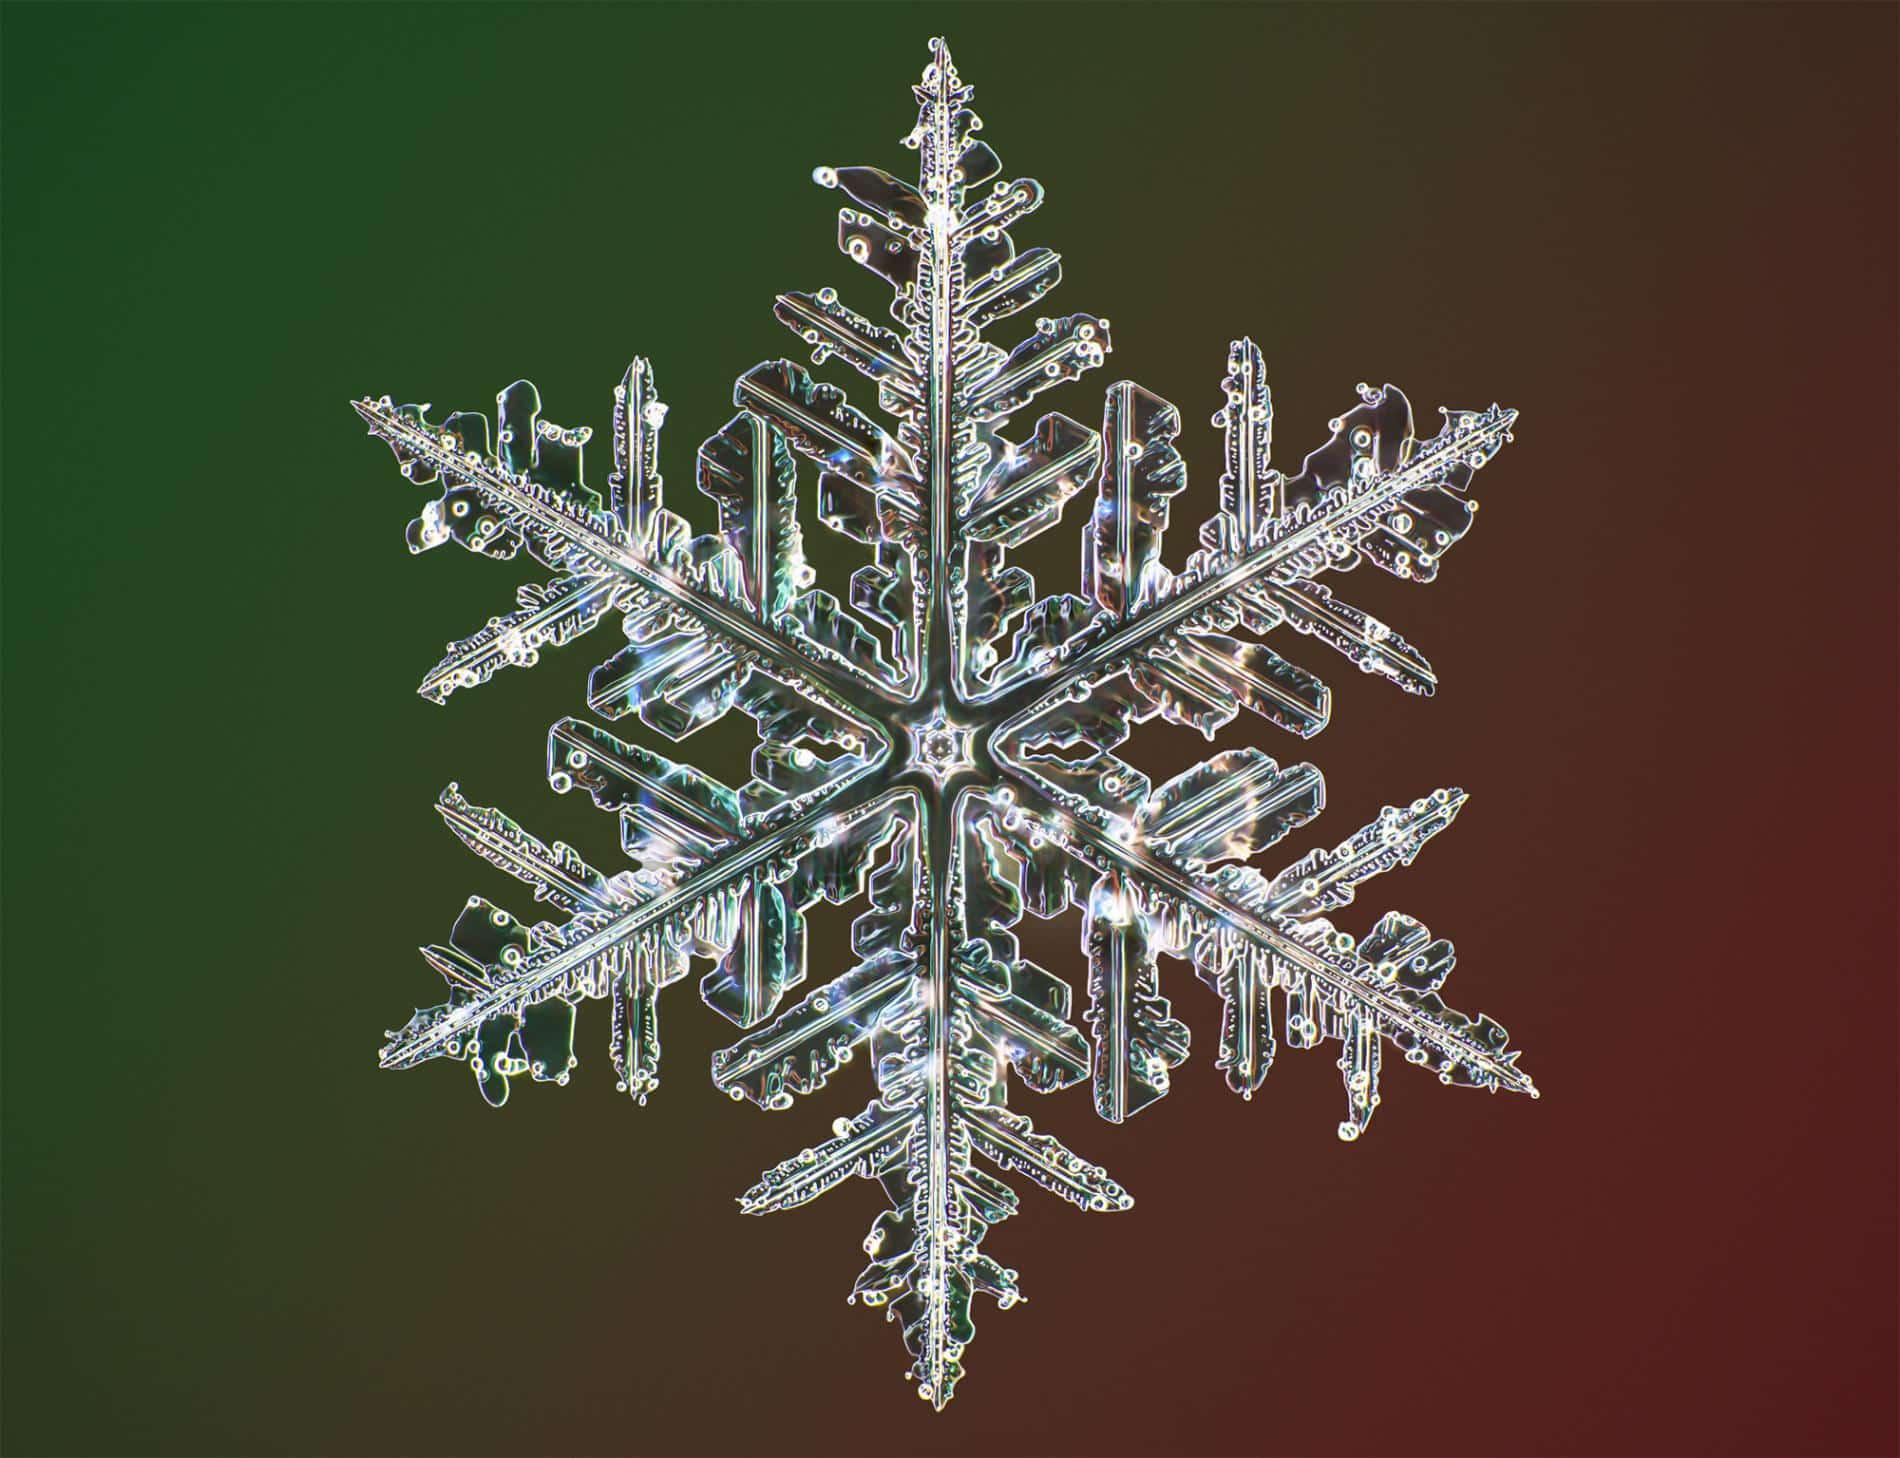 copo de nieve por microscopico